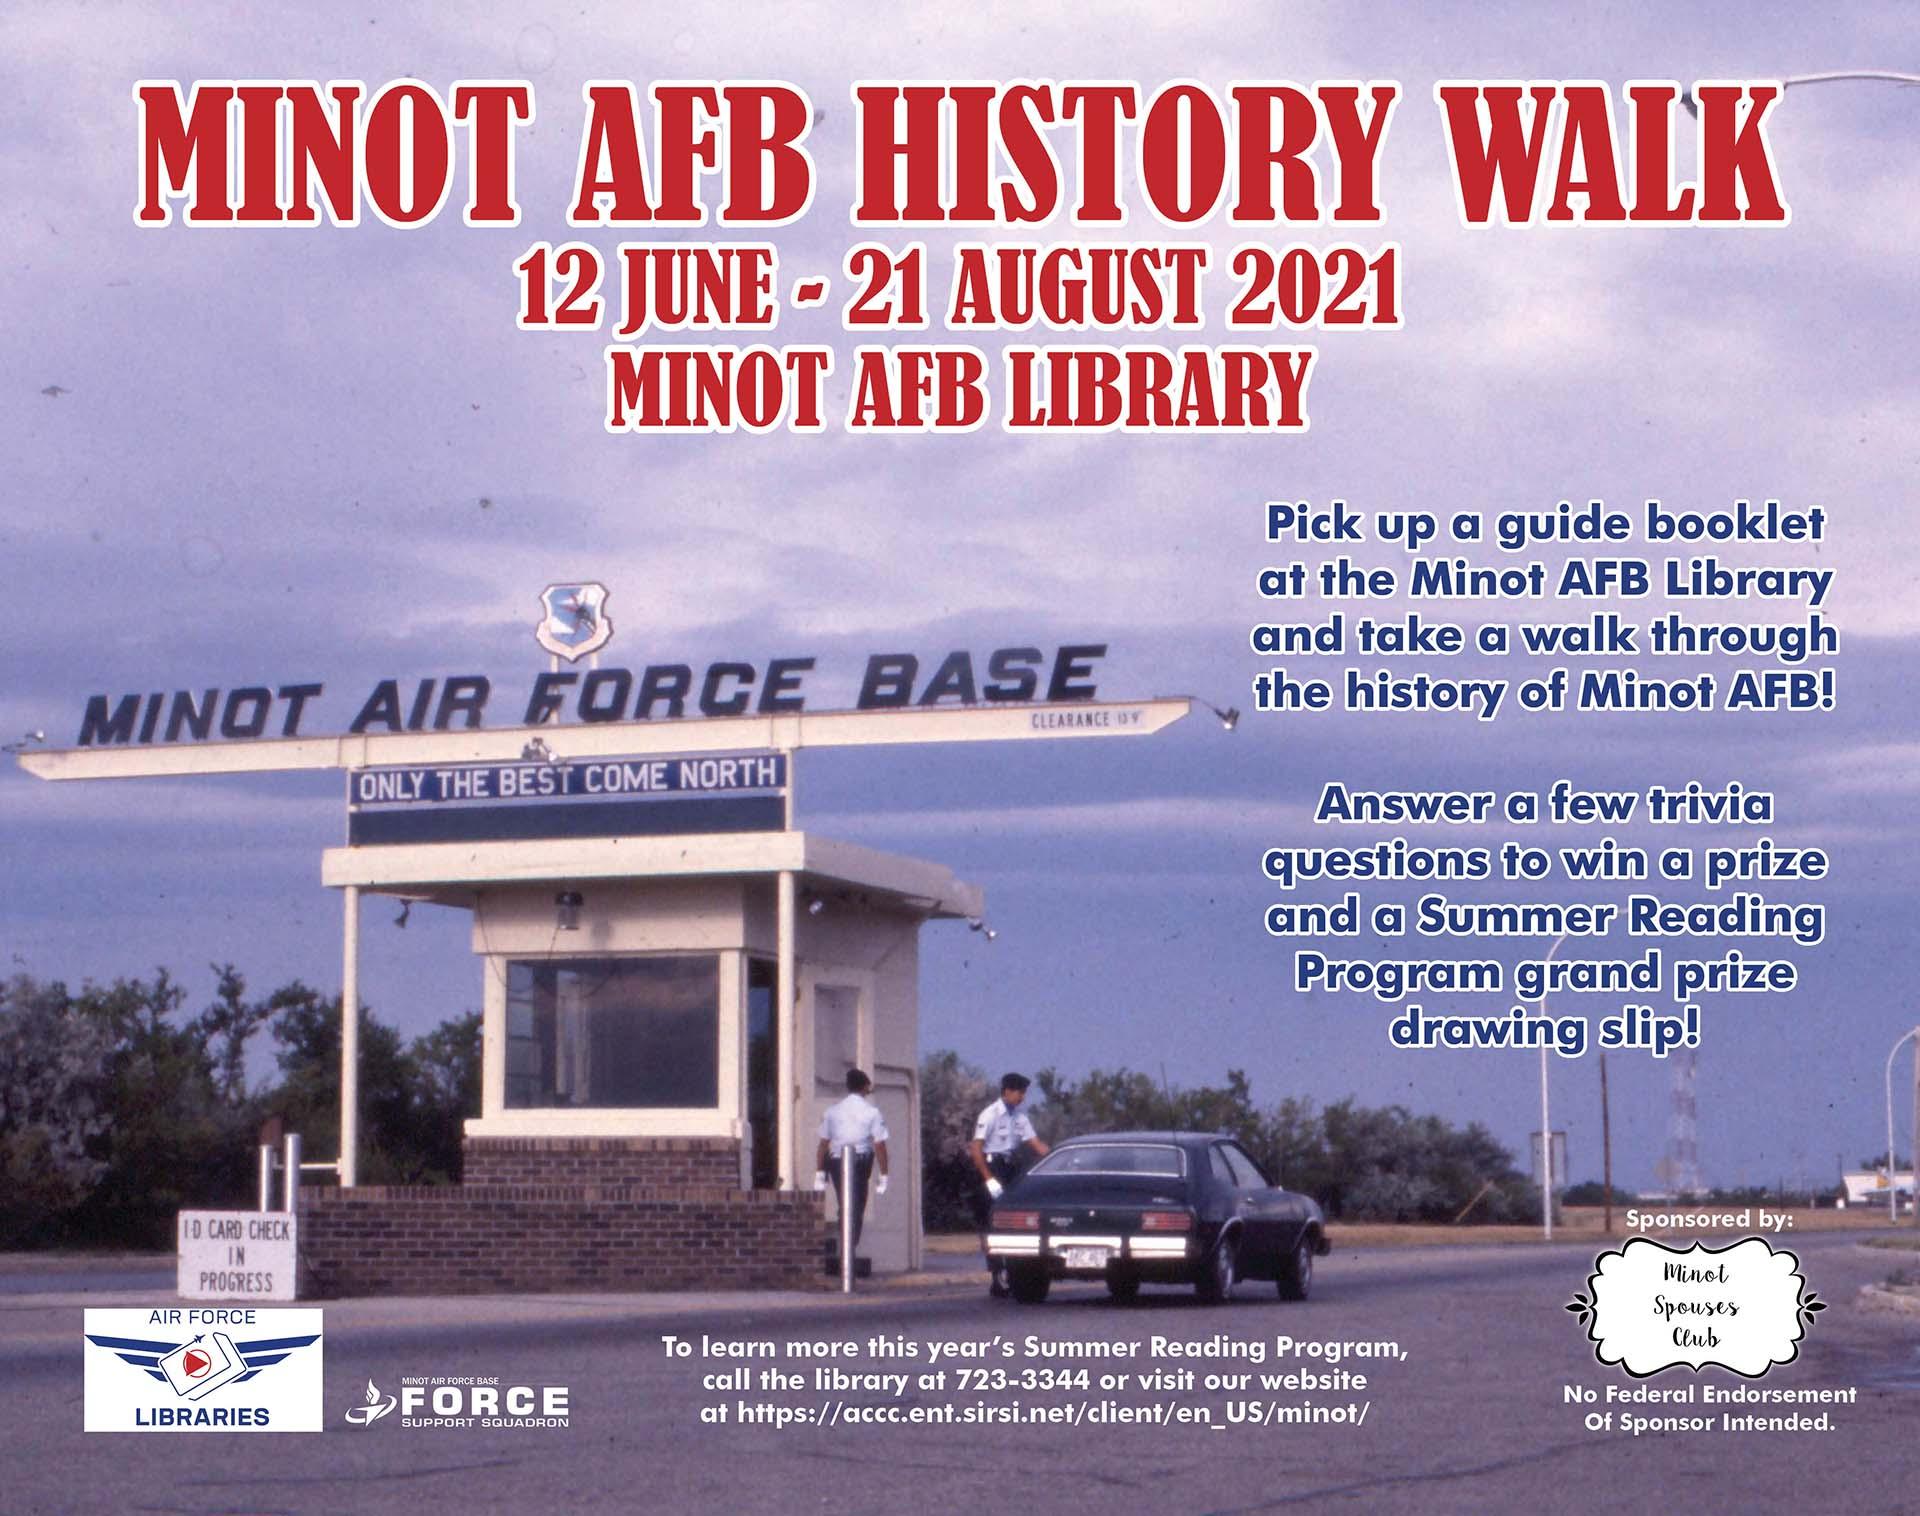 Minot AFB History Walk Begins